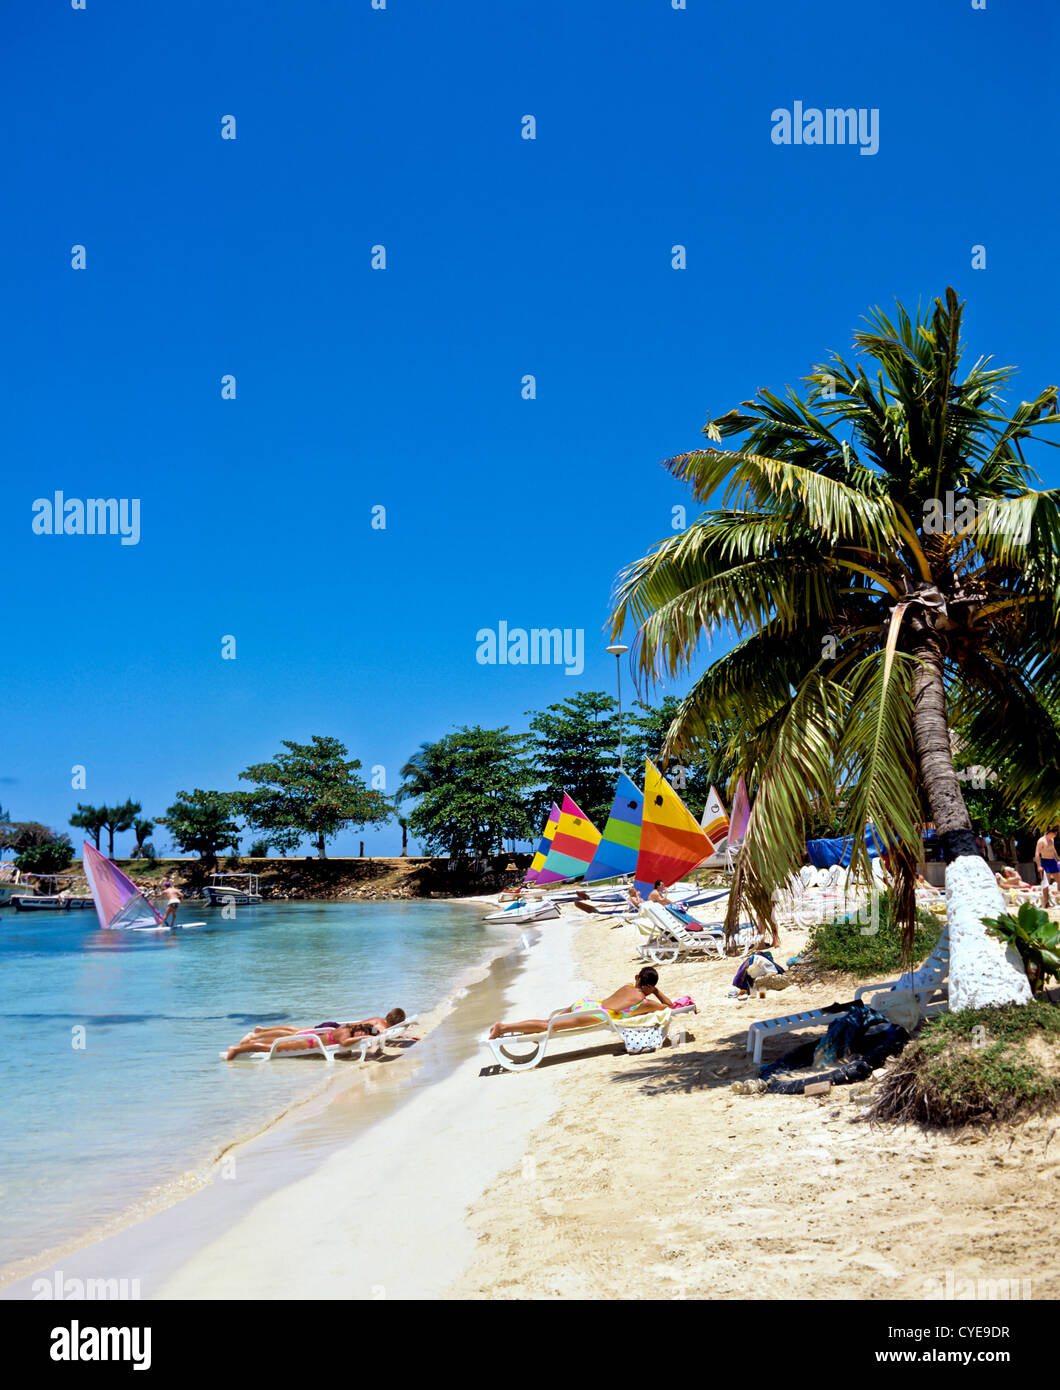 8372. Ocho Rios, Jamaica, Caribbean, West Indies - Stock Image